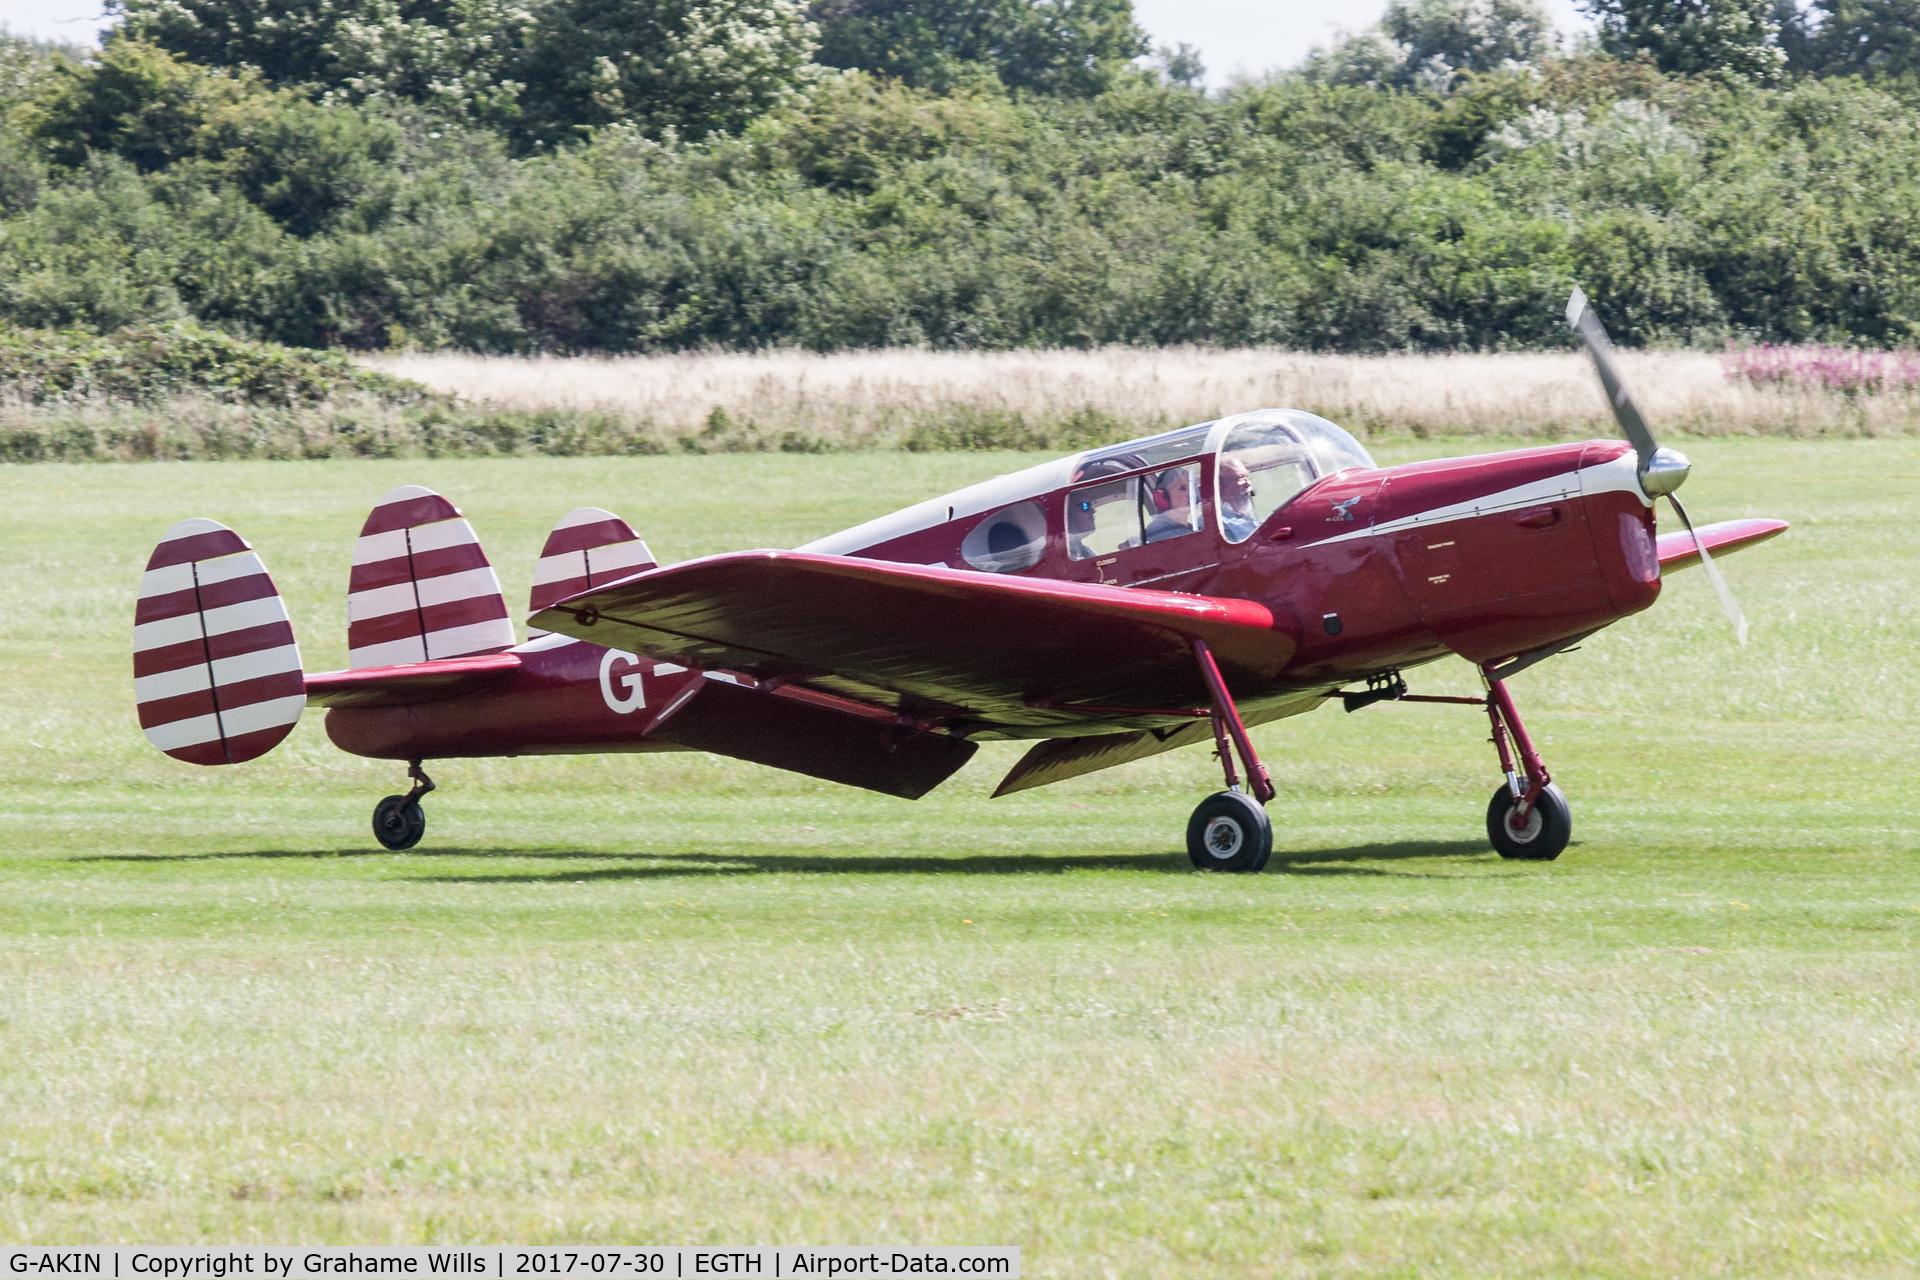 G-AKIN, 1947 Miles M38 Messenger 2A C/N 6728, Miles Messenger 2A G-AKIN Sywell Messenger Trust Gathering of Moths Old Warden 30/7/17